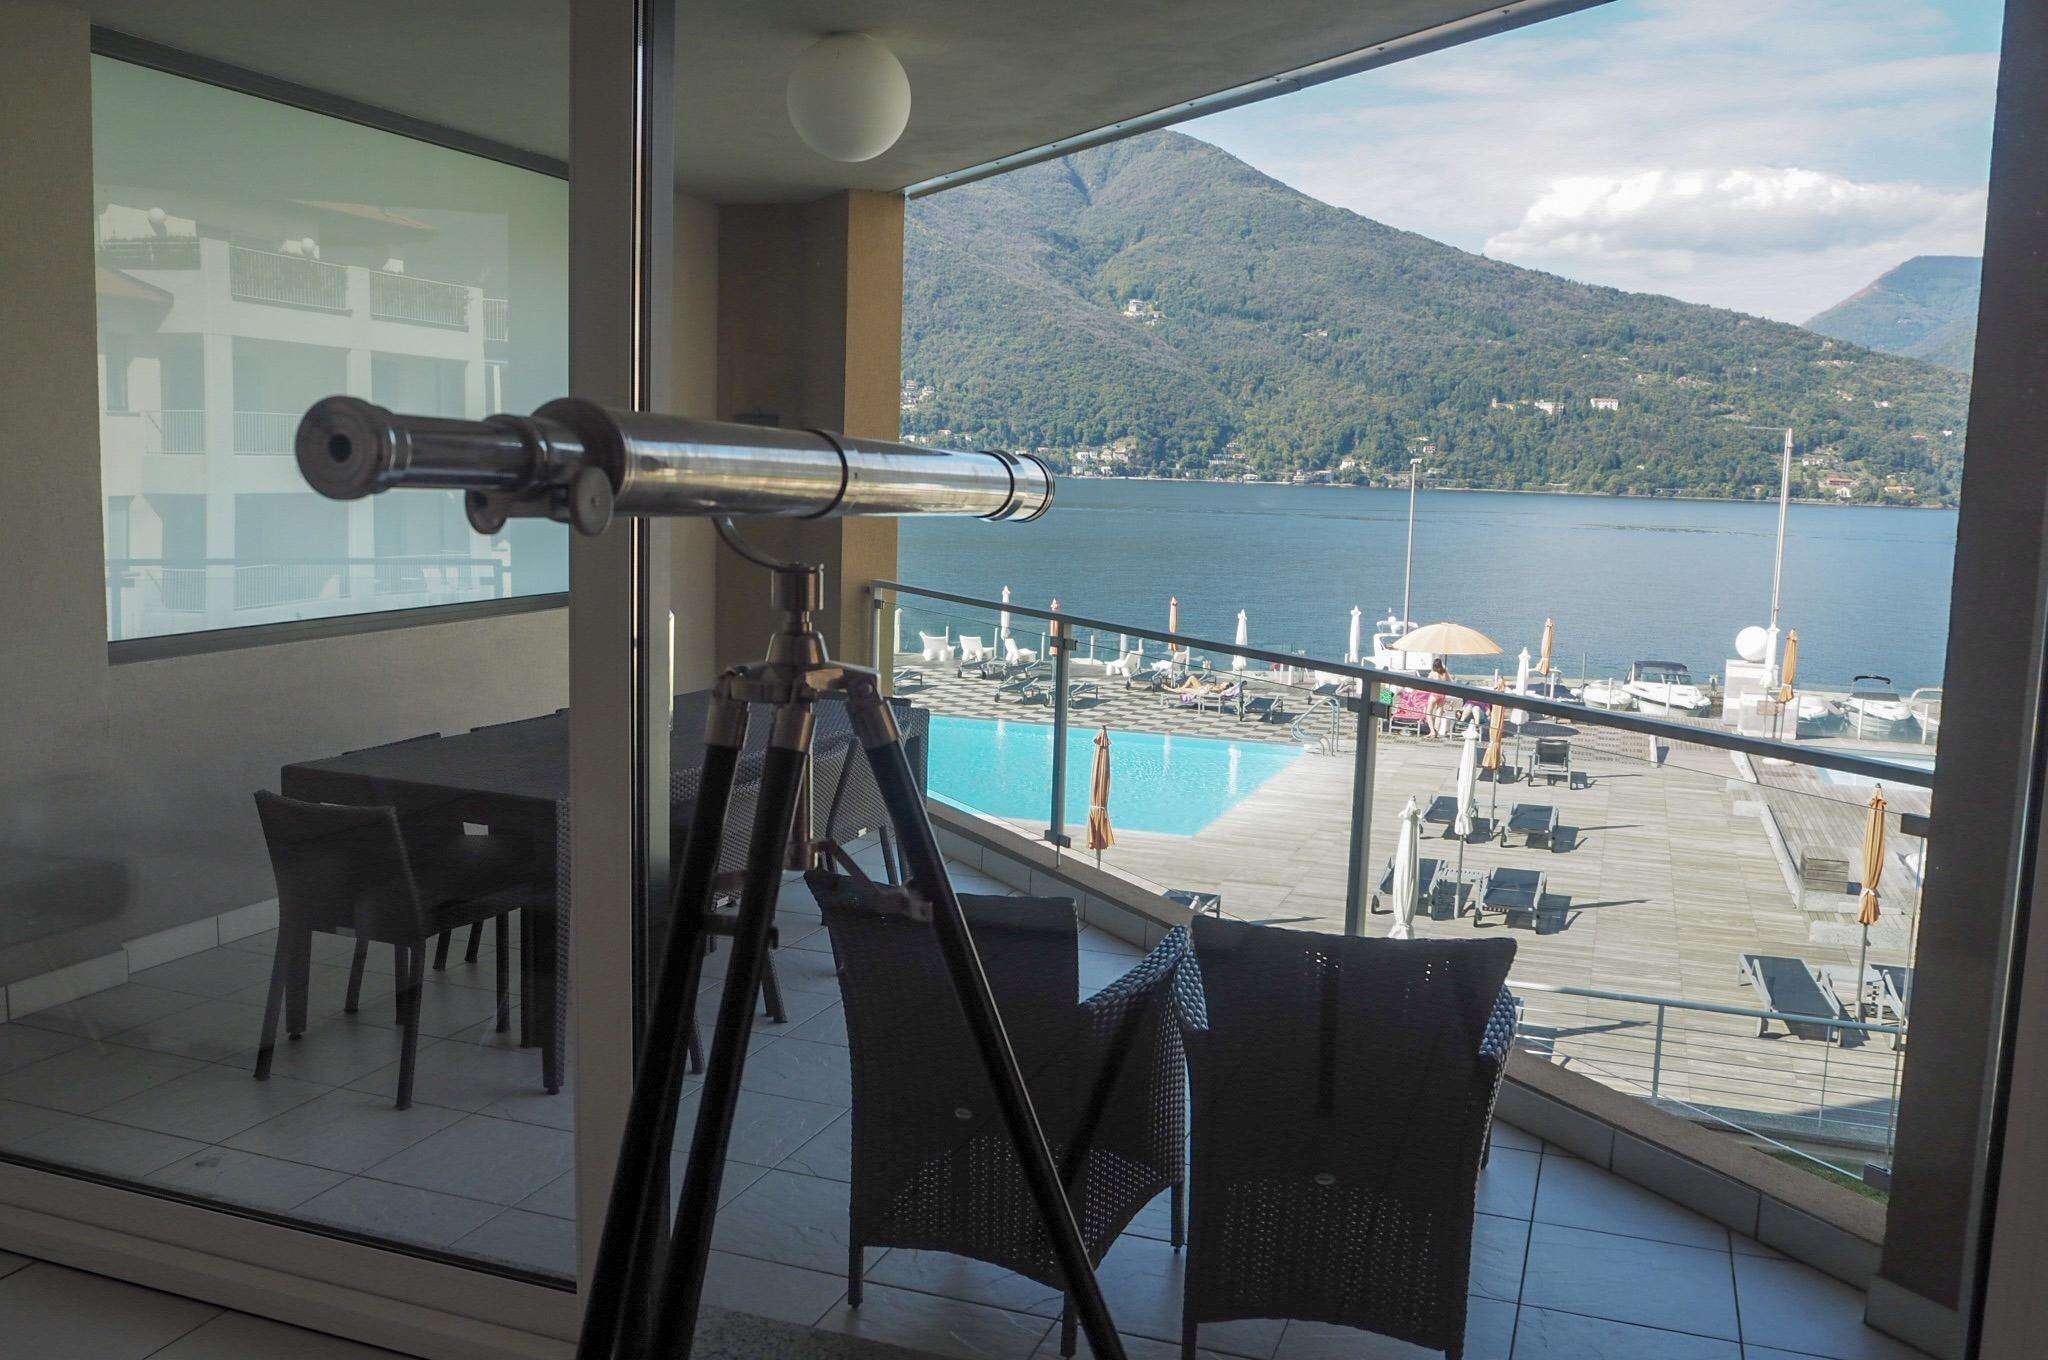 Apartments views to the pool at Golfo Gabella Resort Lake Maggiore